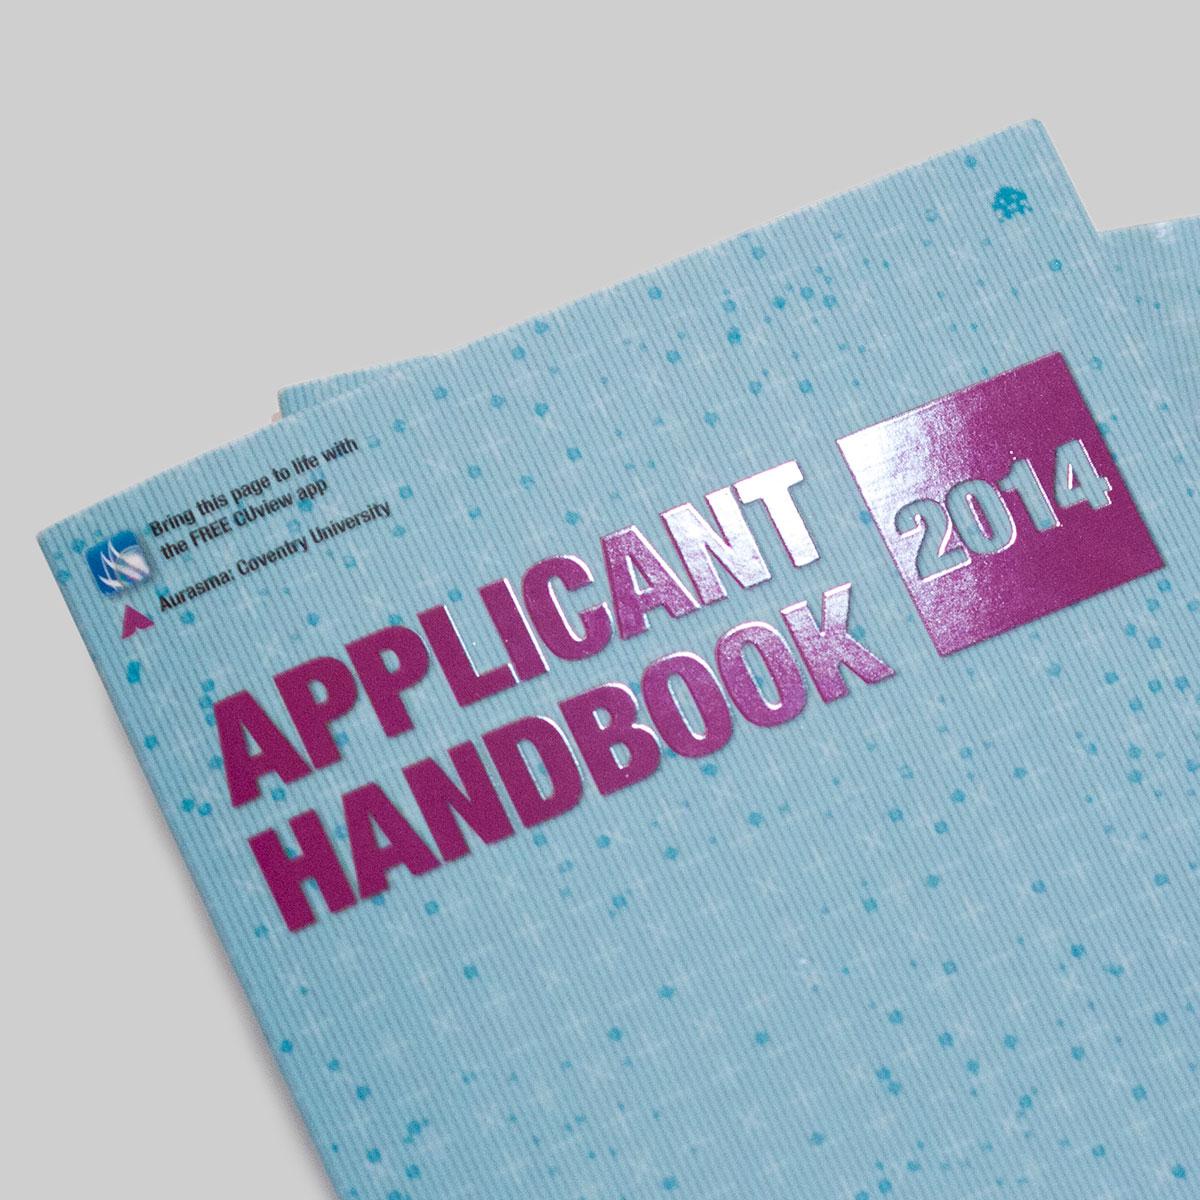 Applicant Handbook booklet design